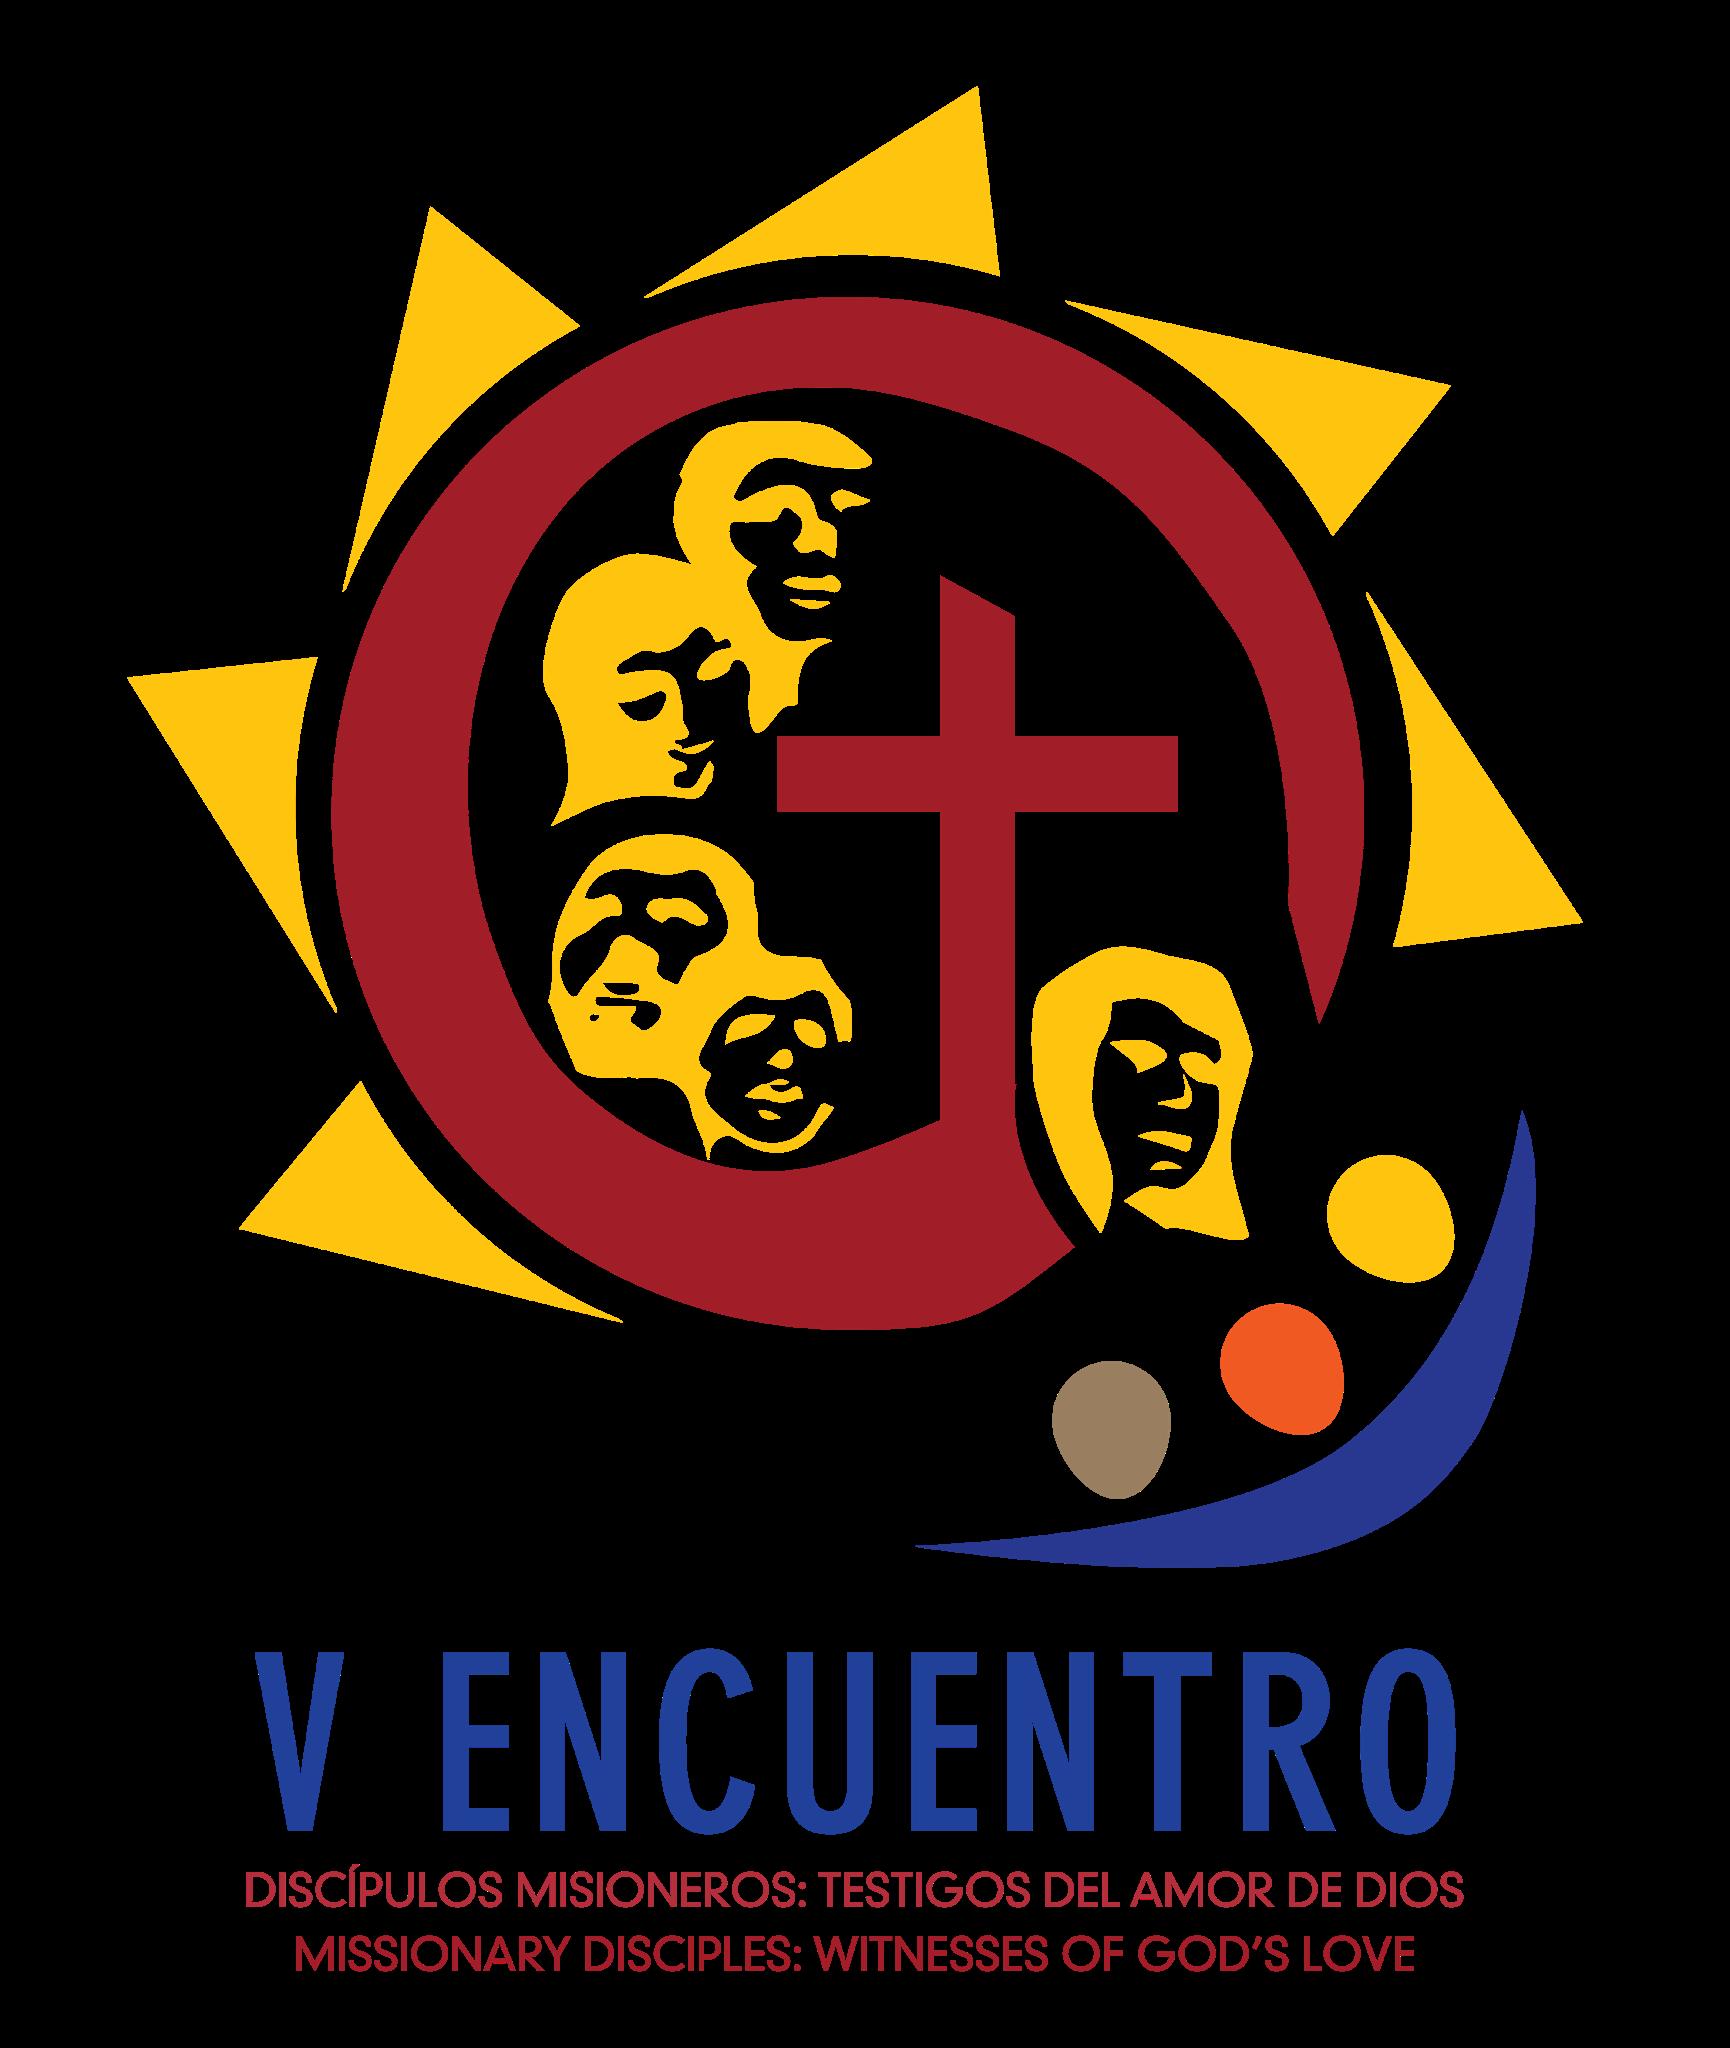 V-EncuentoLogo-bilingual.png